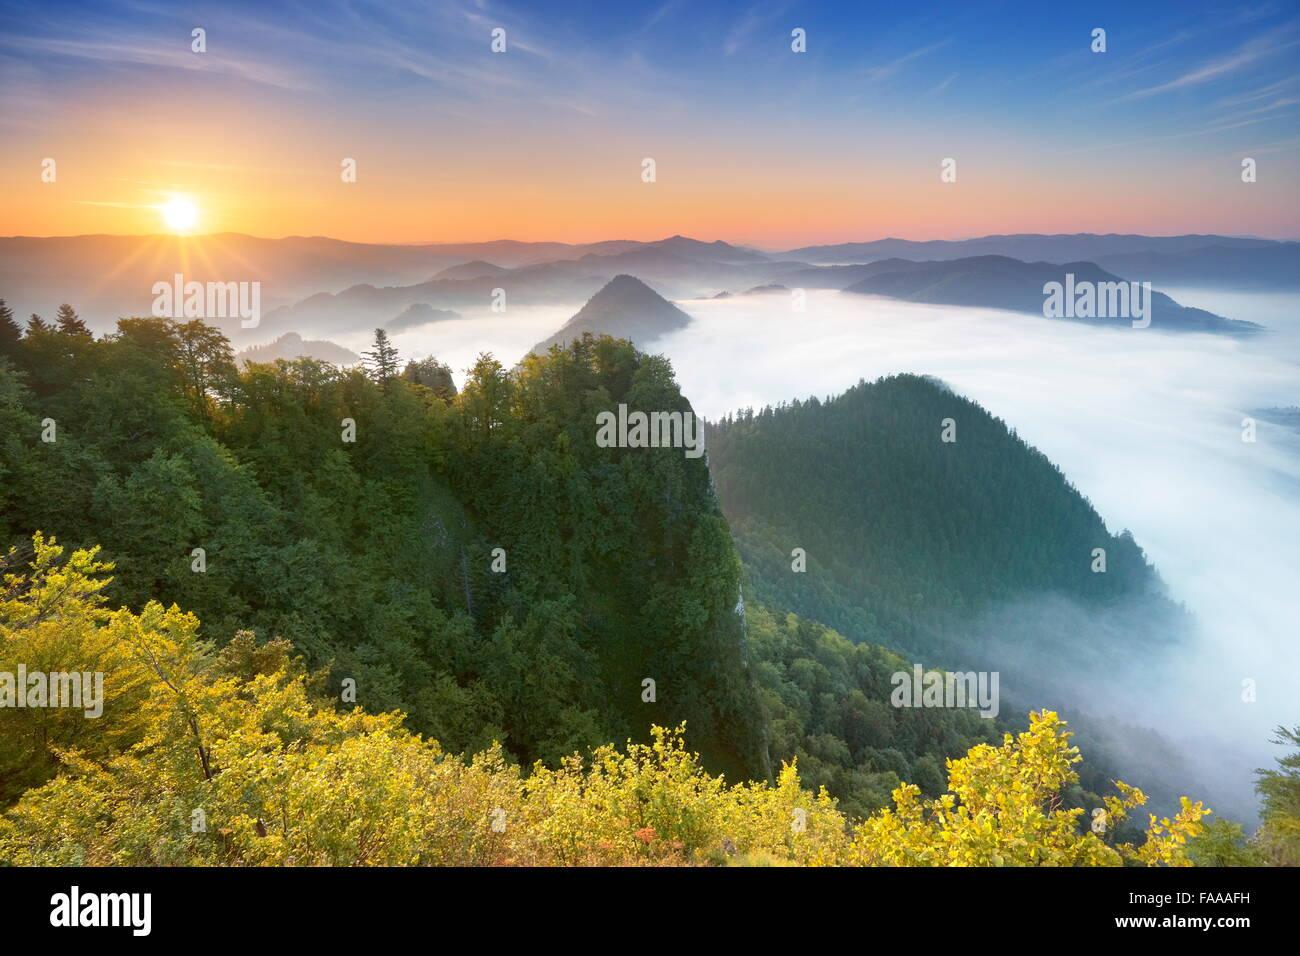 Pieniny Mountains, view from Trzy Korony Peak, Poland - Stock Image